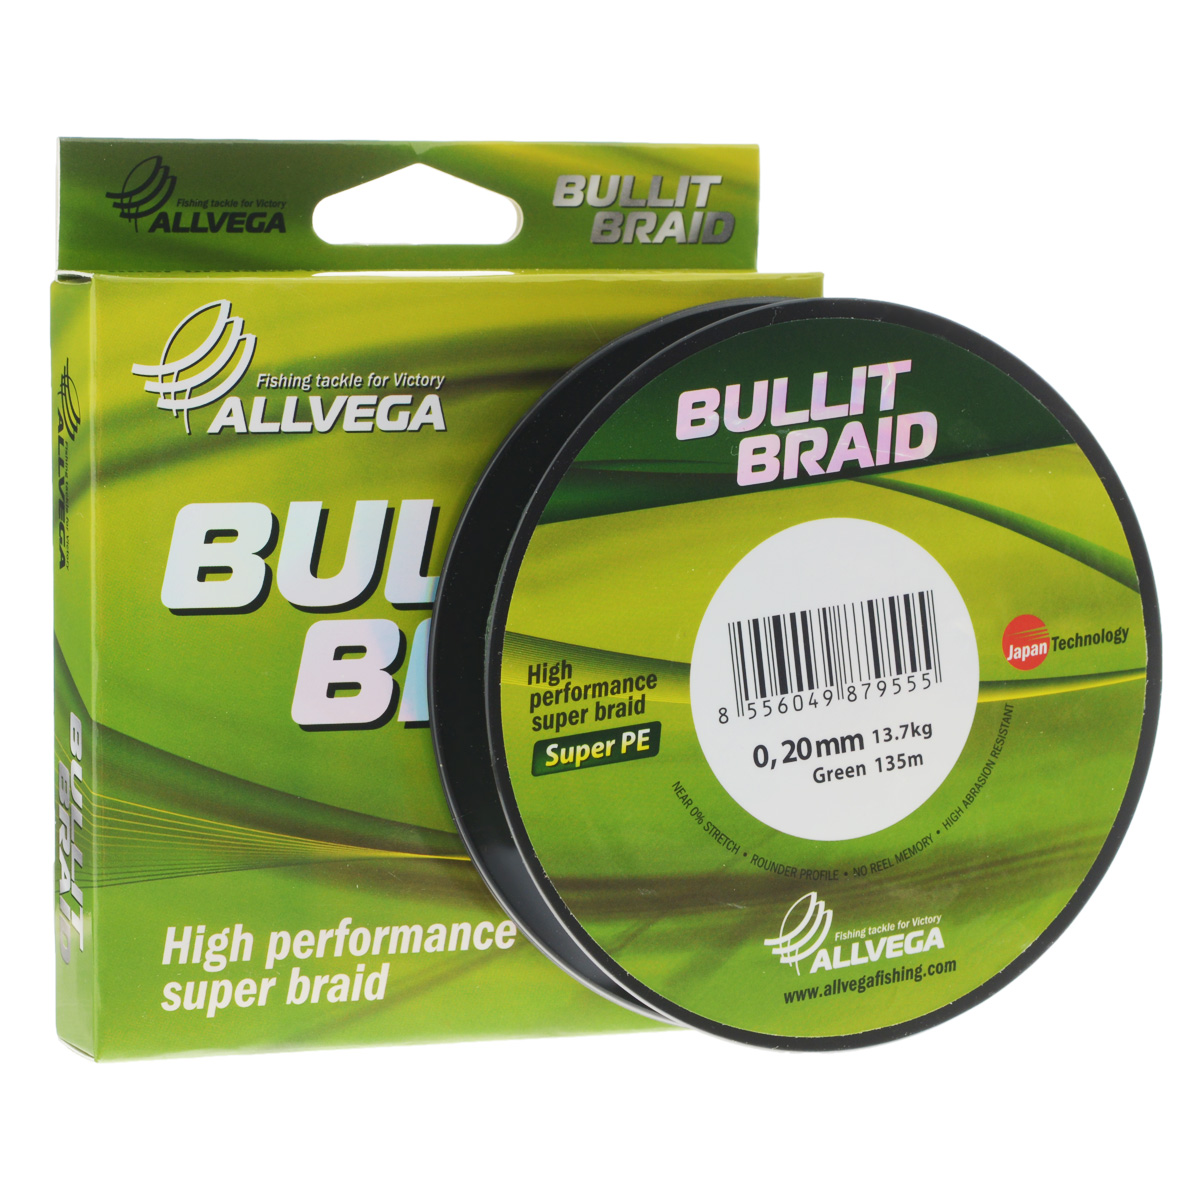 Леска плетеная Allvega Bullit Braid, цвет: темно-зеленый, 135 м, 0,20 мм, 13,7 кг